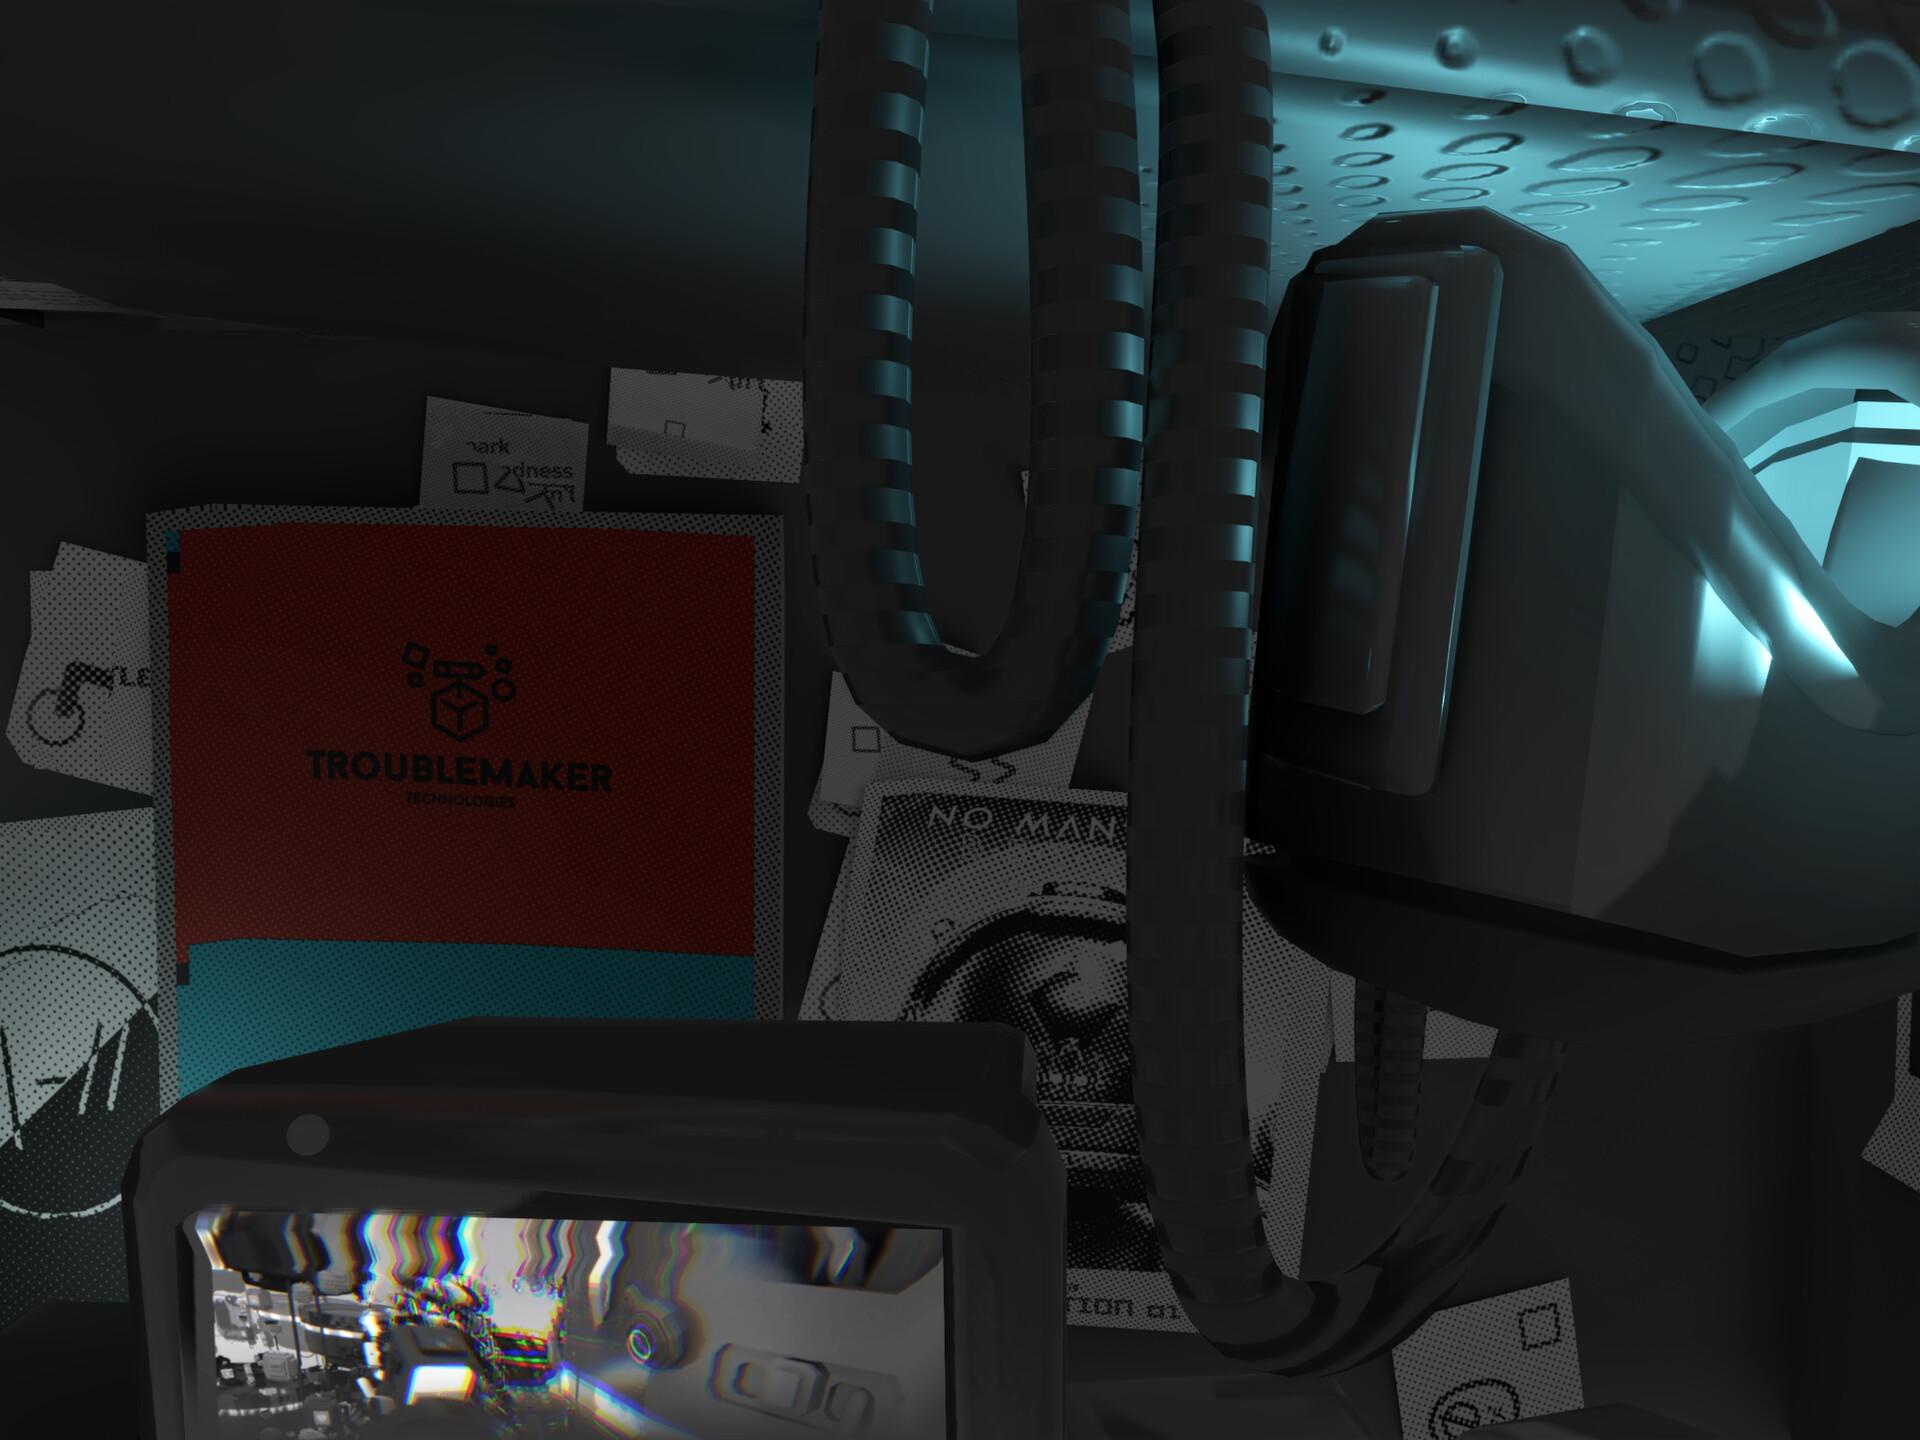 Skylar thomas capsule3